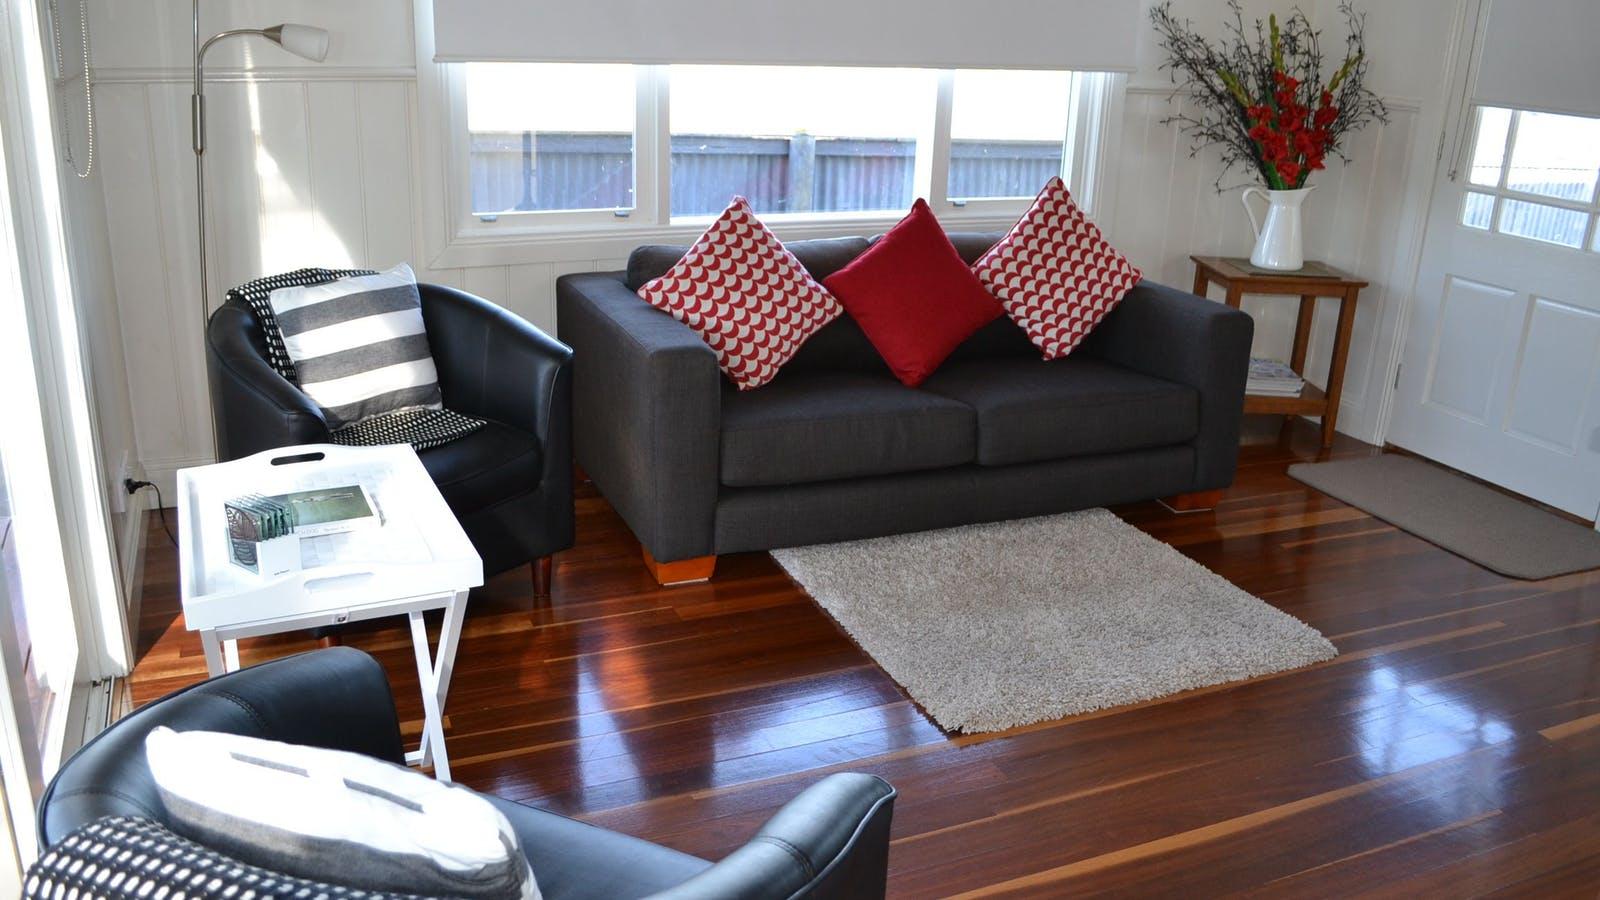 Calgary House sitting area